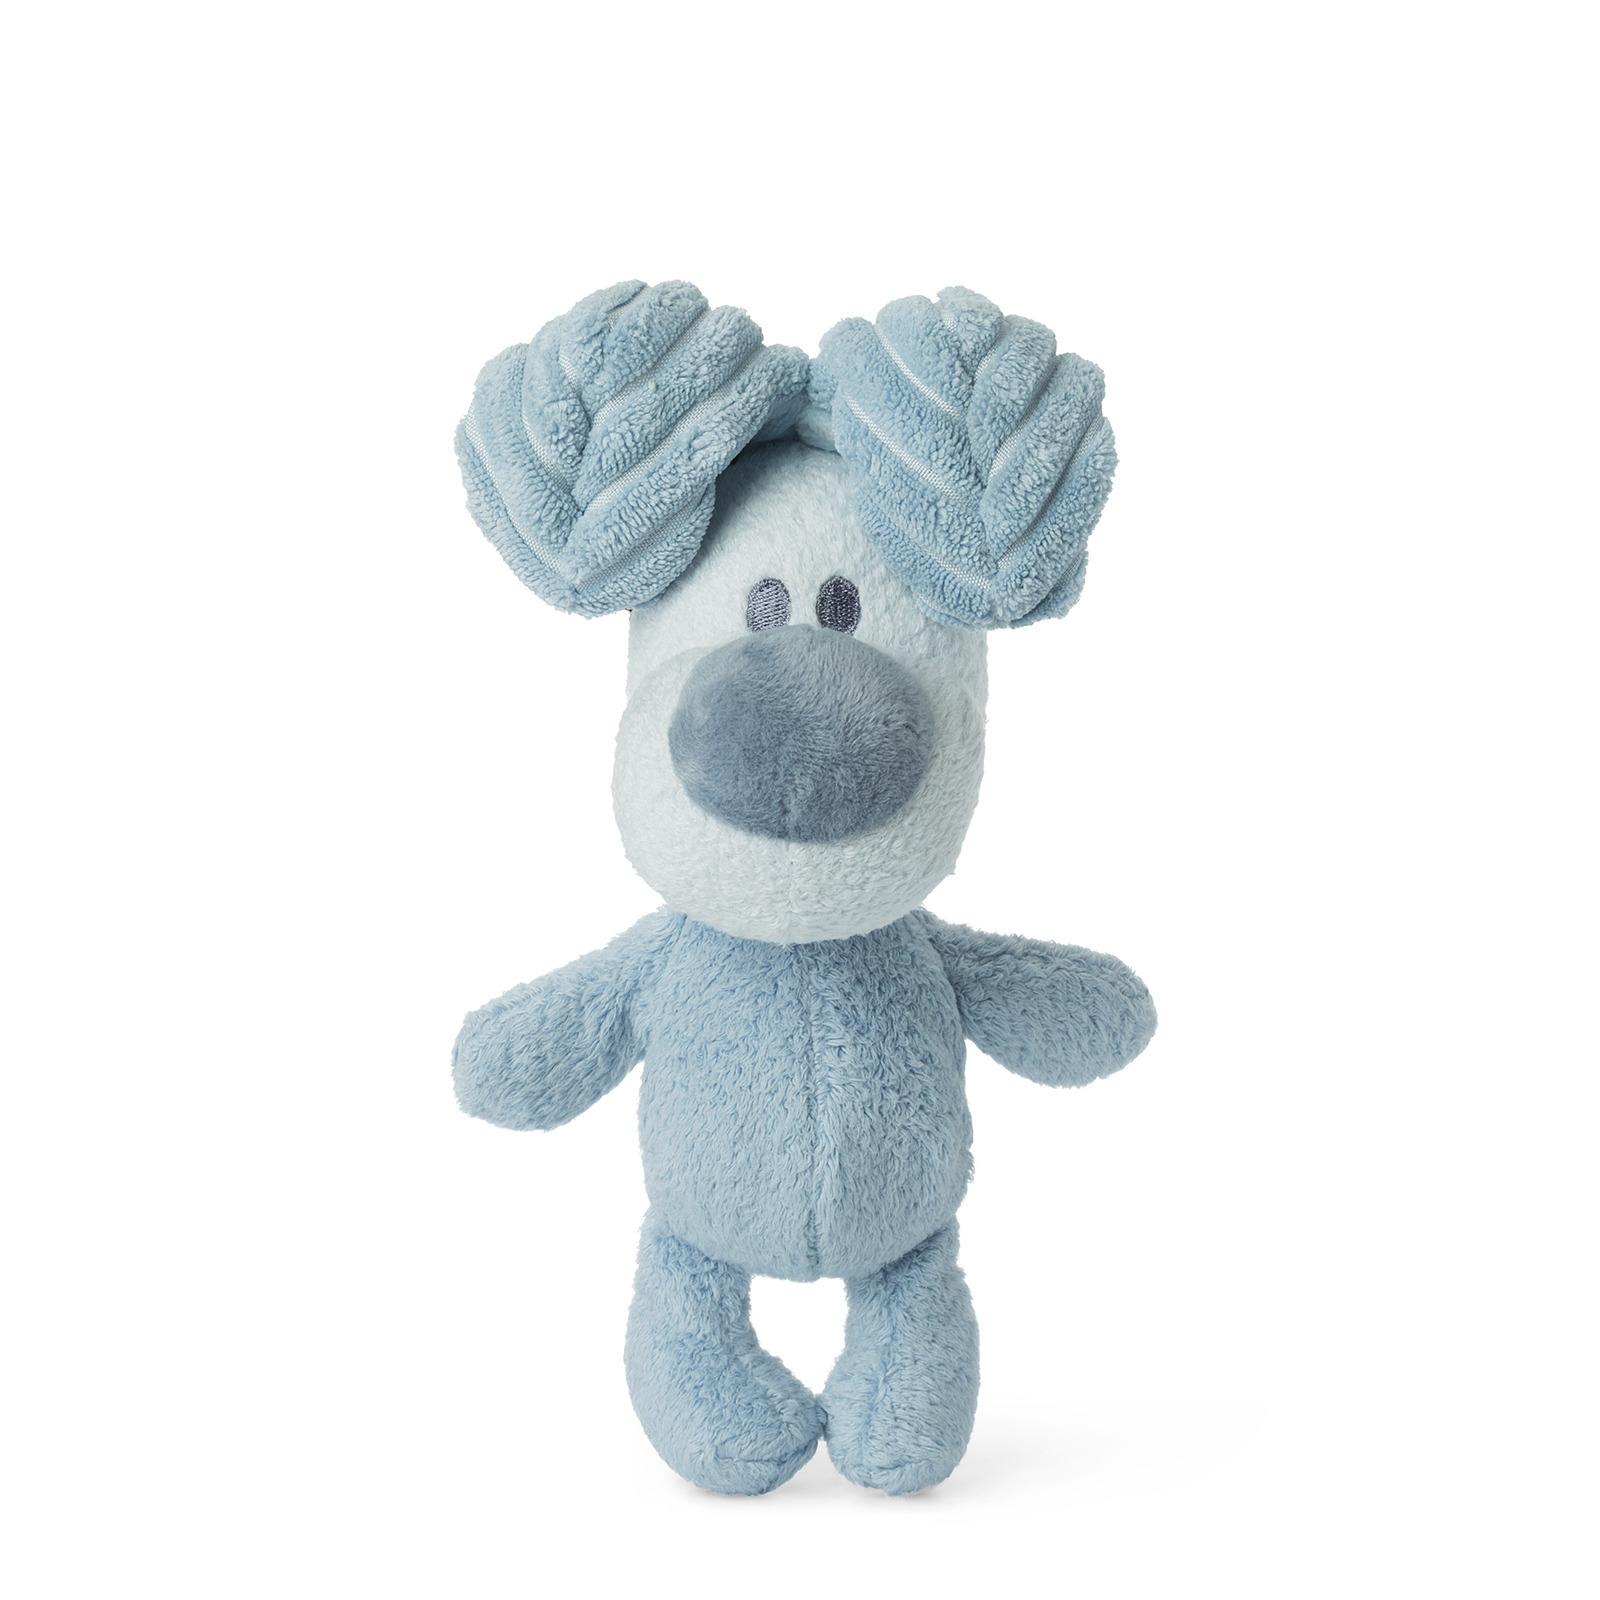 Pluche honden knuffel Woezel blauw 19 cm